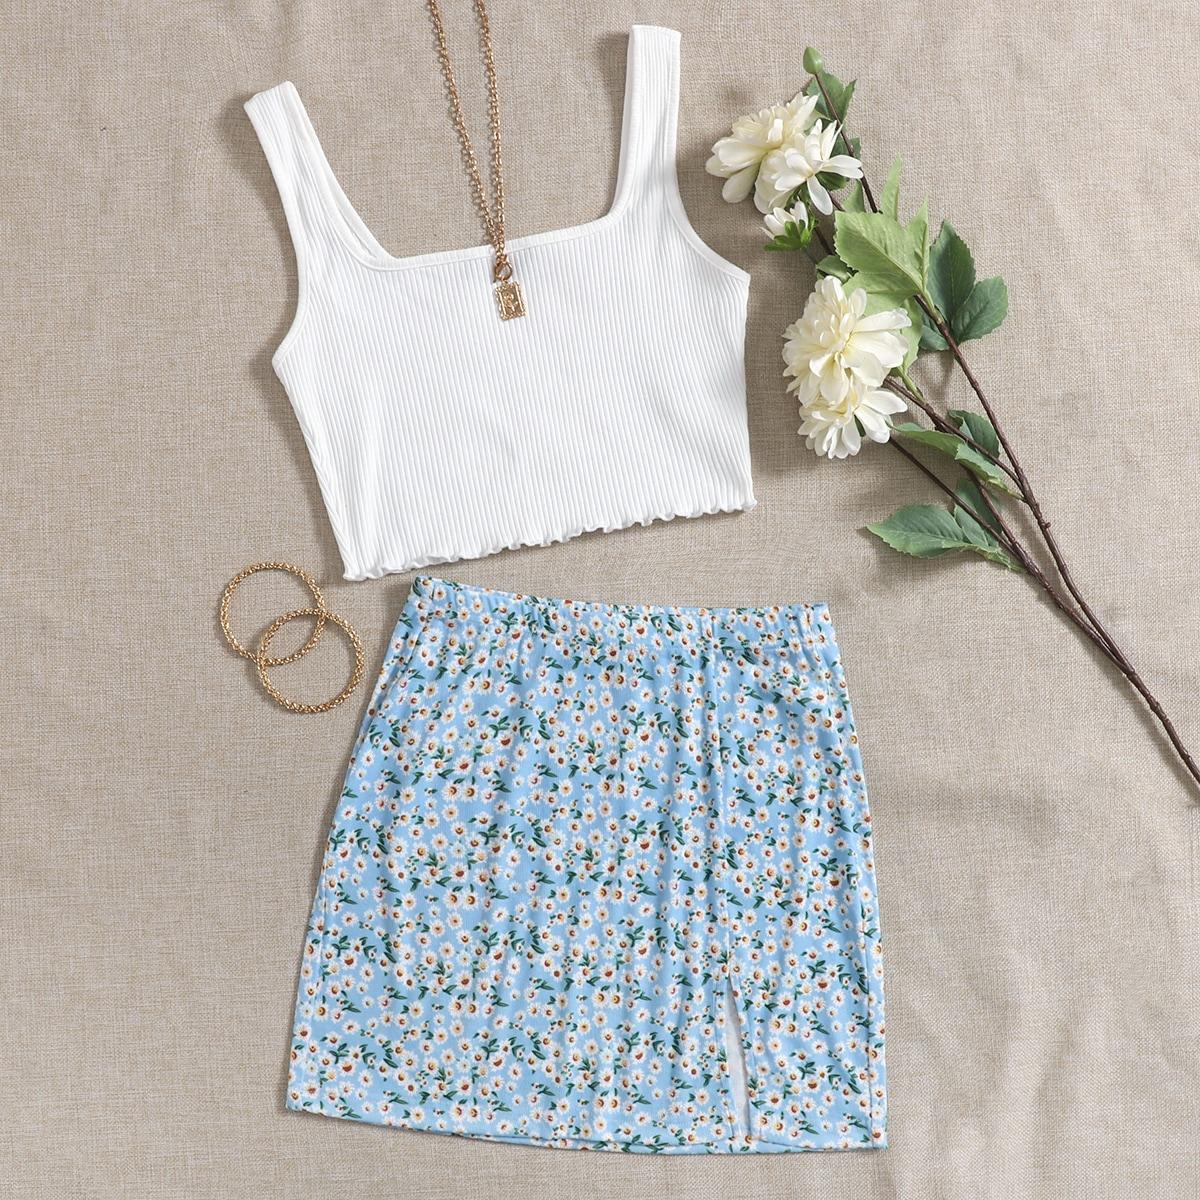 Lettuce Edge Tank Top & Slit Hem Daisy Floral Skirt Set, SHEIN  - buy with discount